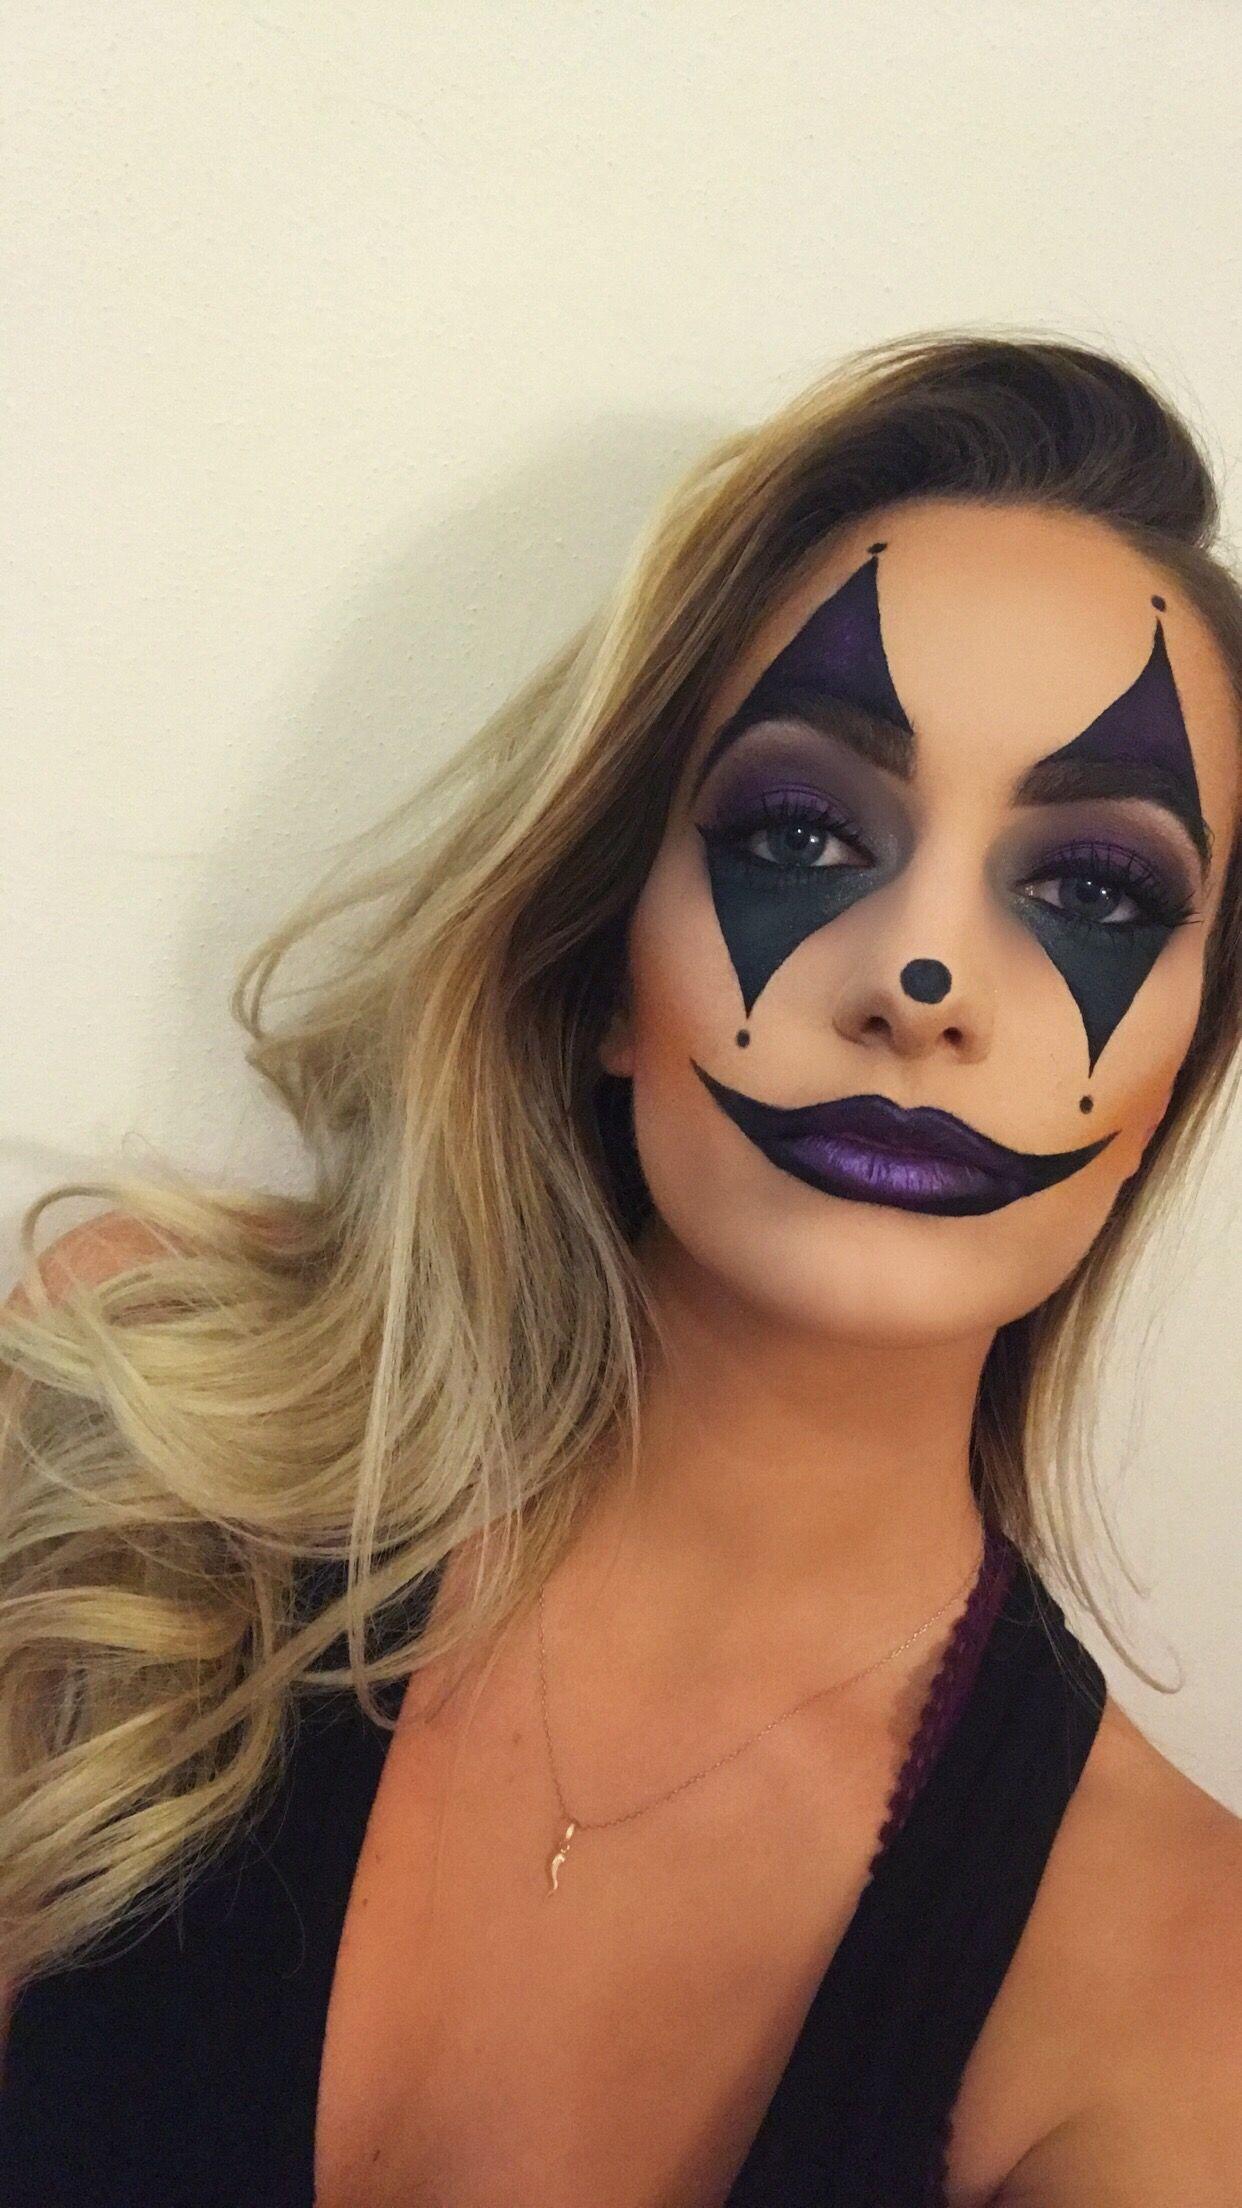 joker jester clown makeup halloween costume verkleidung. Black Bedroom Furniture Sets. Home Design Ideas